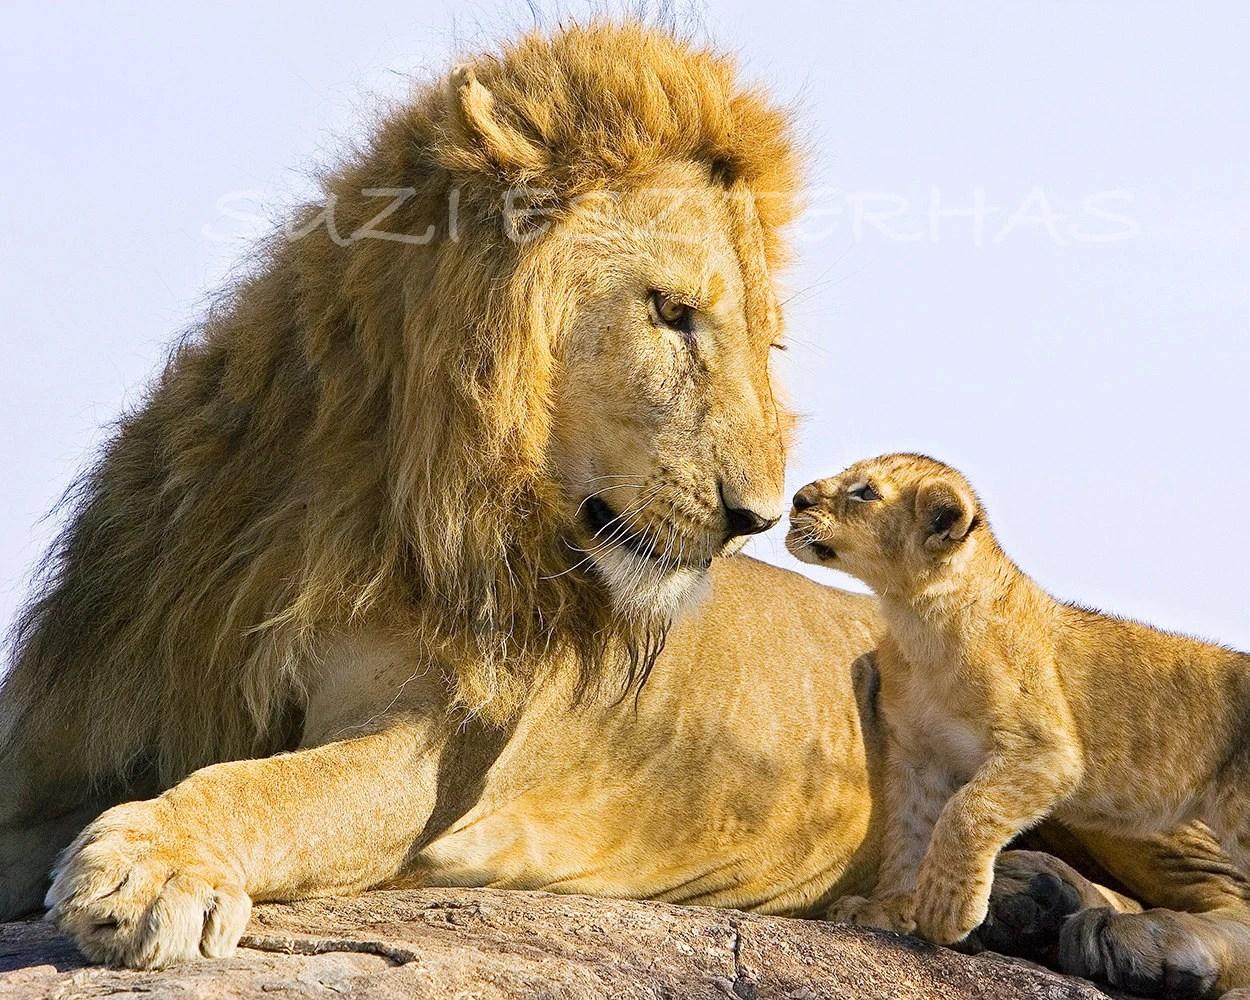 Safari Baby Animal Photography Set Of 4 Photos By